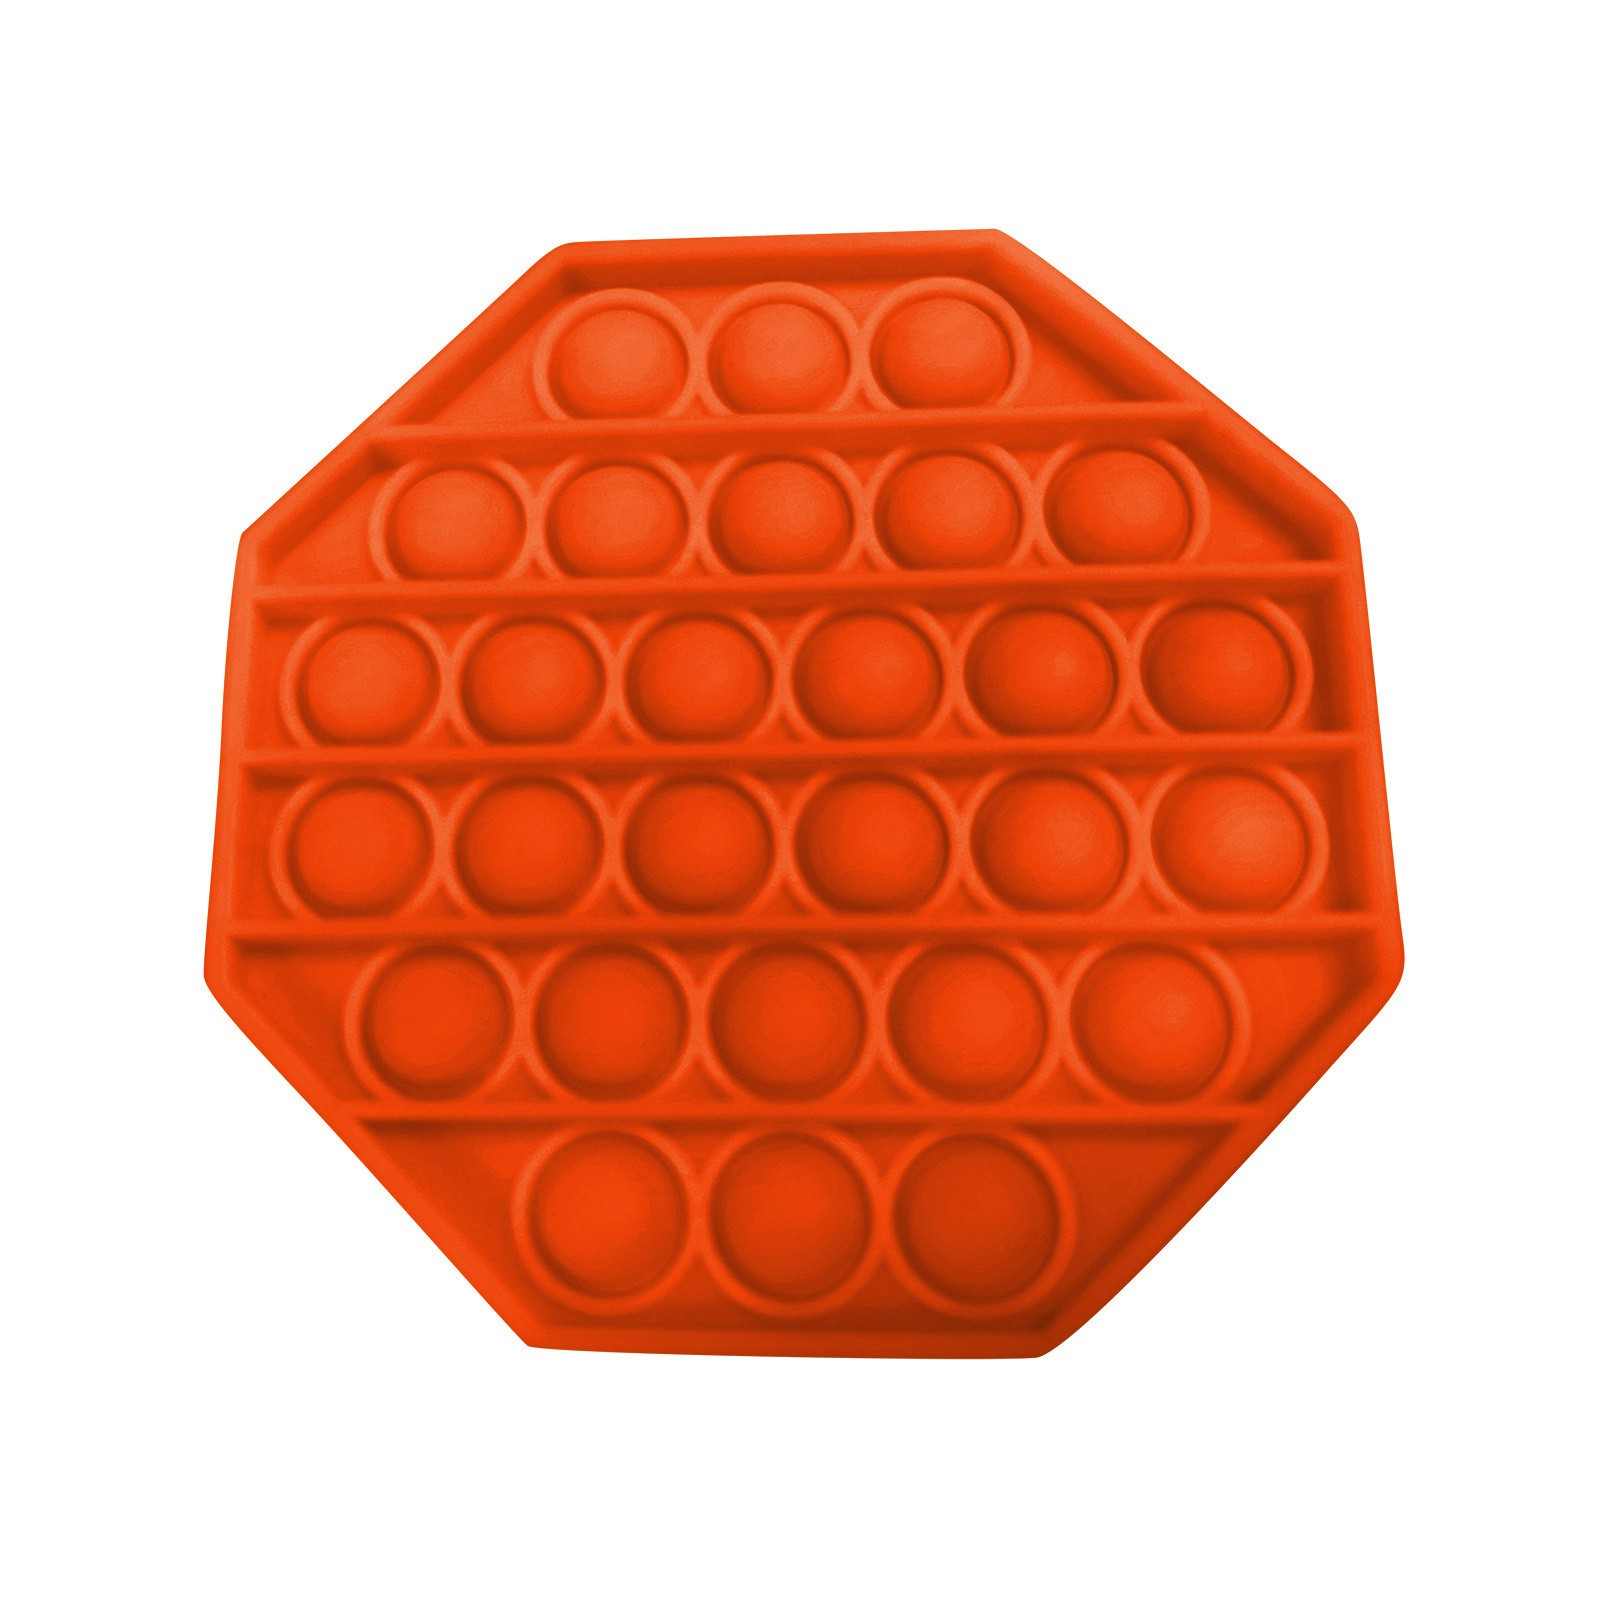 Toy Fidget-Toys Sensory-Toy Needs-Stress Push Bubble Popit Special Kids Simple Dimple img5